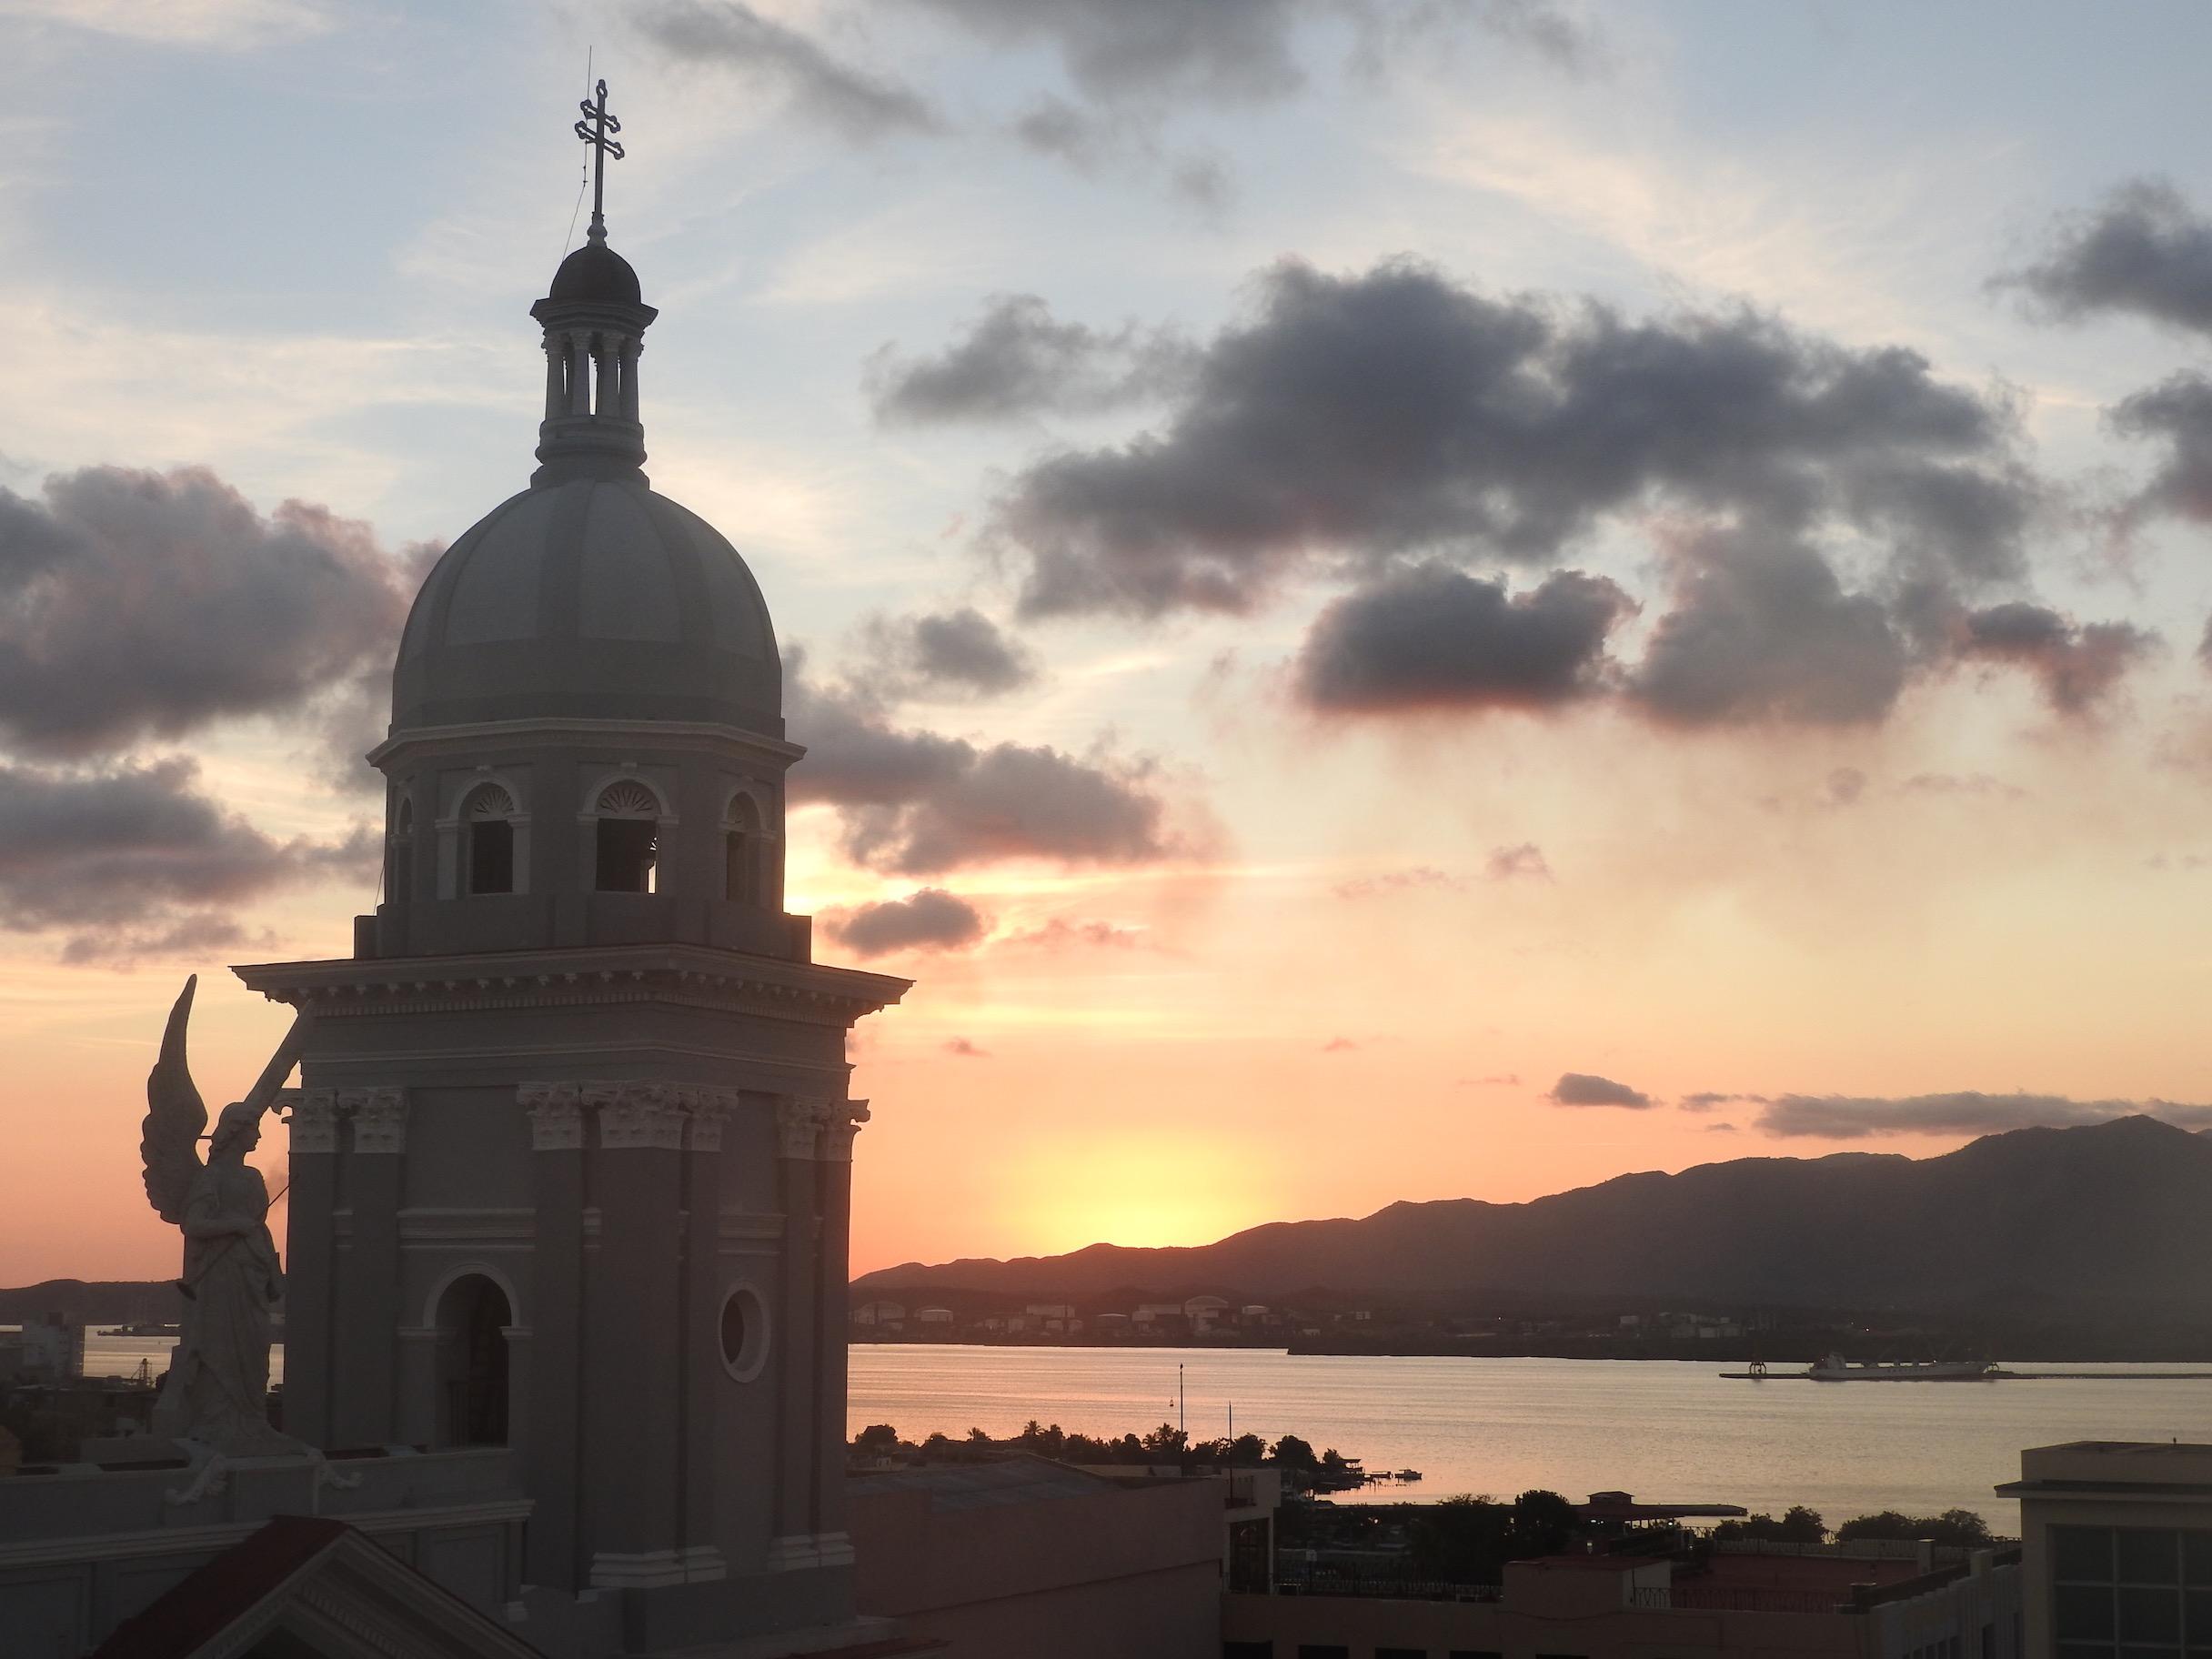 The Caribbean, Santiago de Cuba